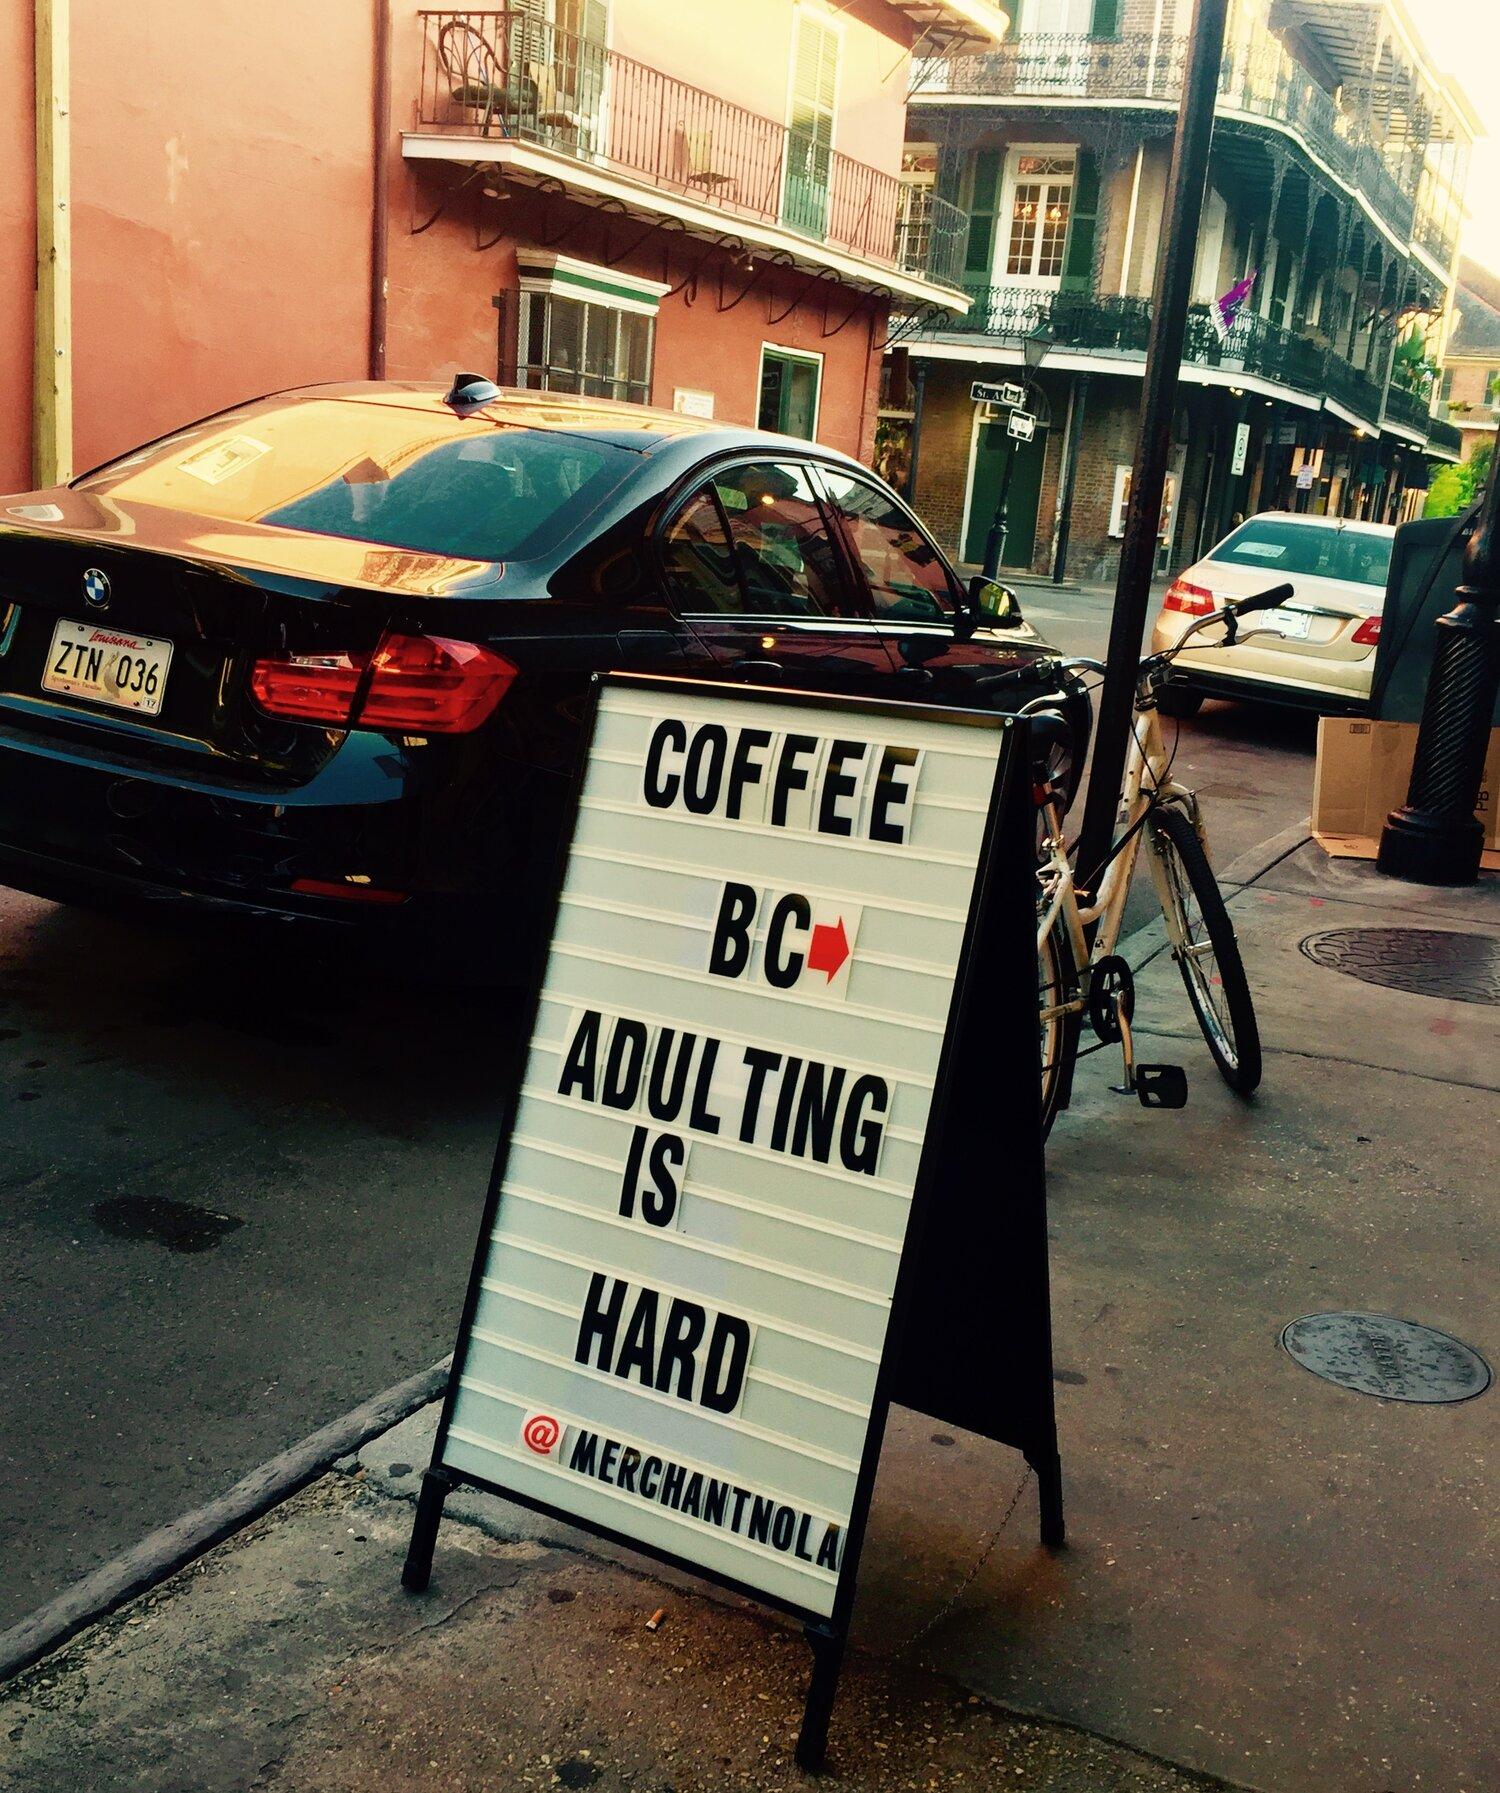 Coffee Adulting photo.jpg